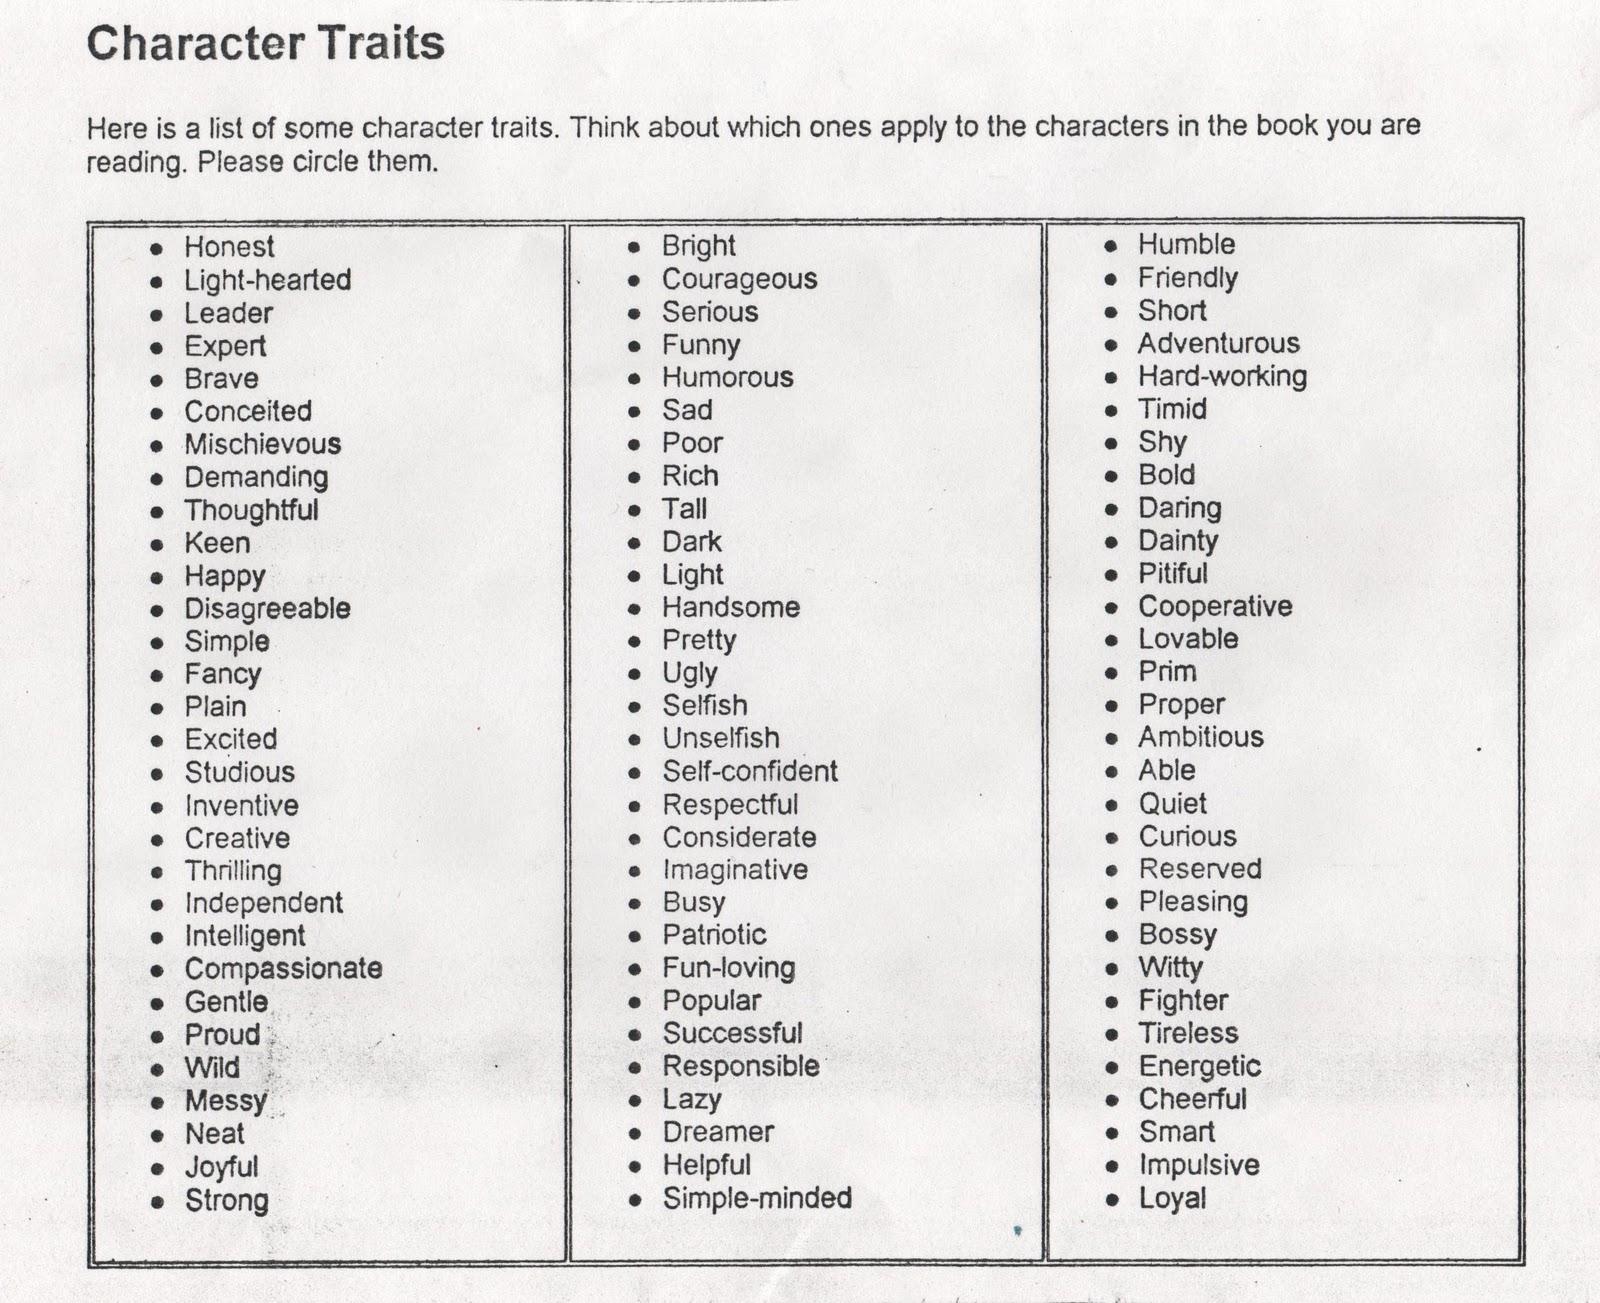 character traits list printable images